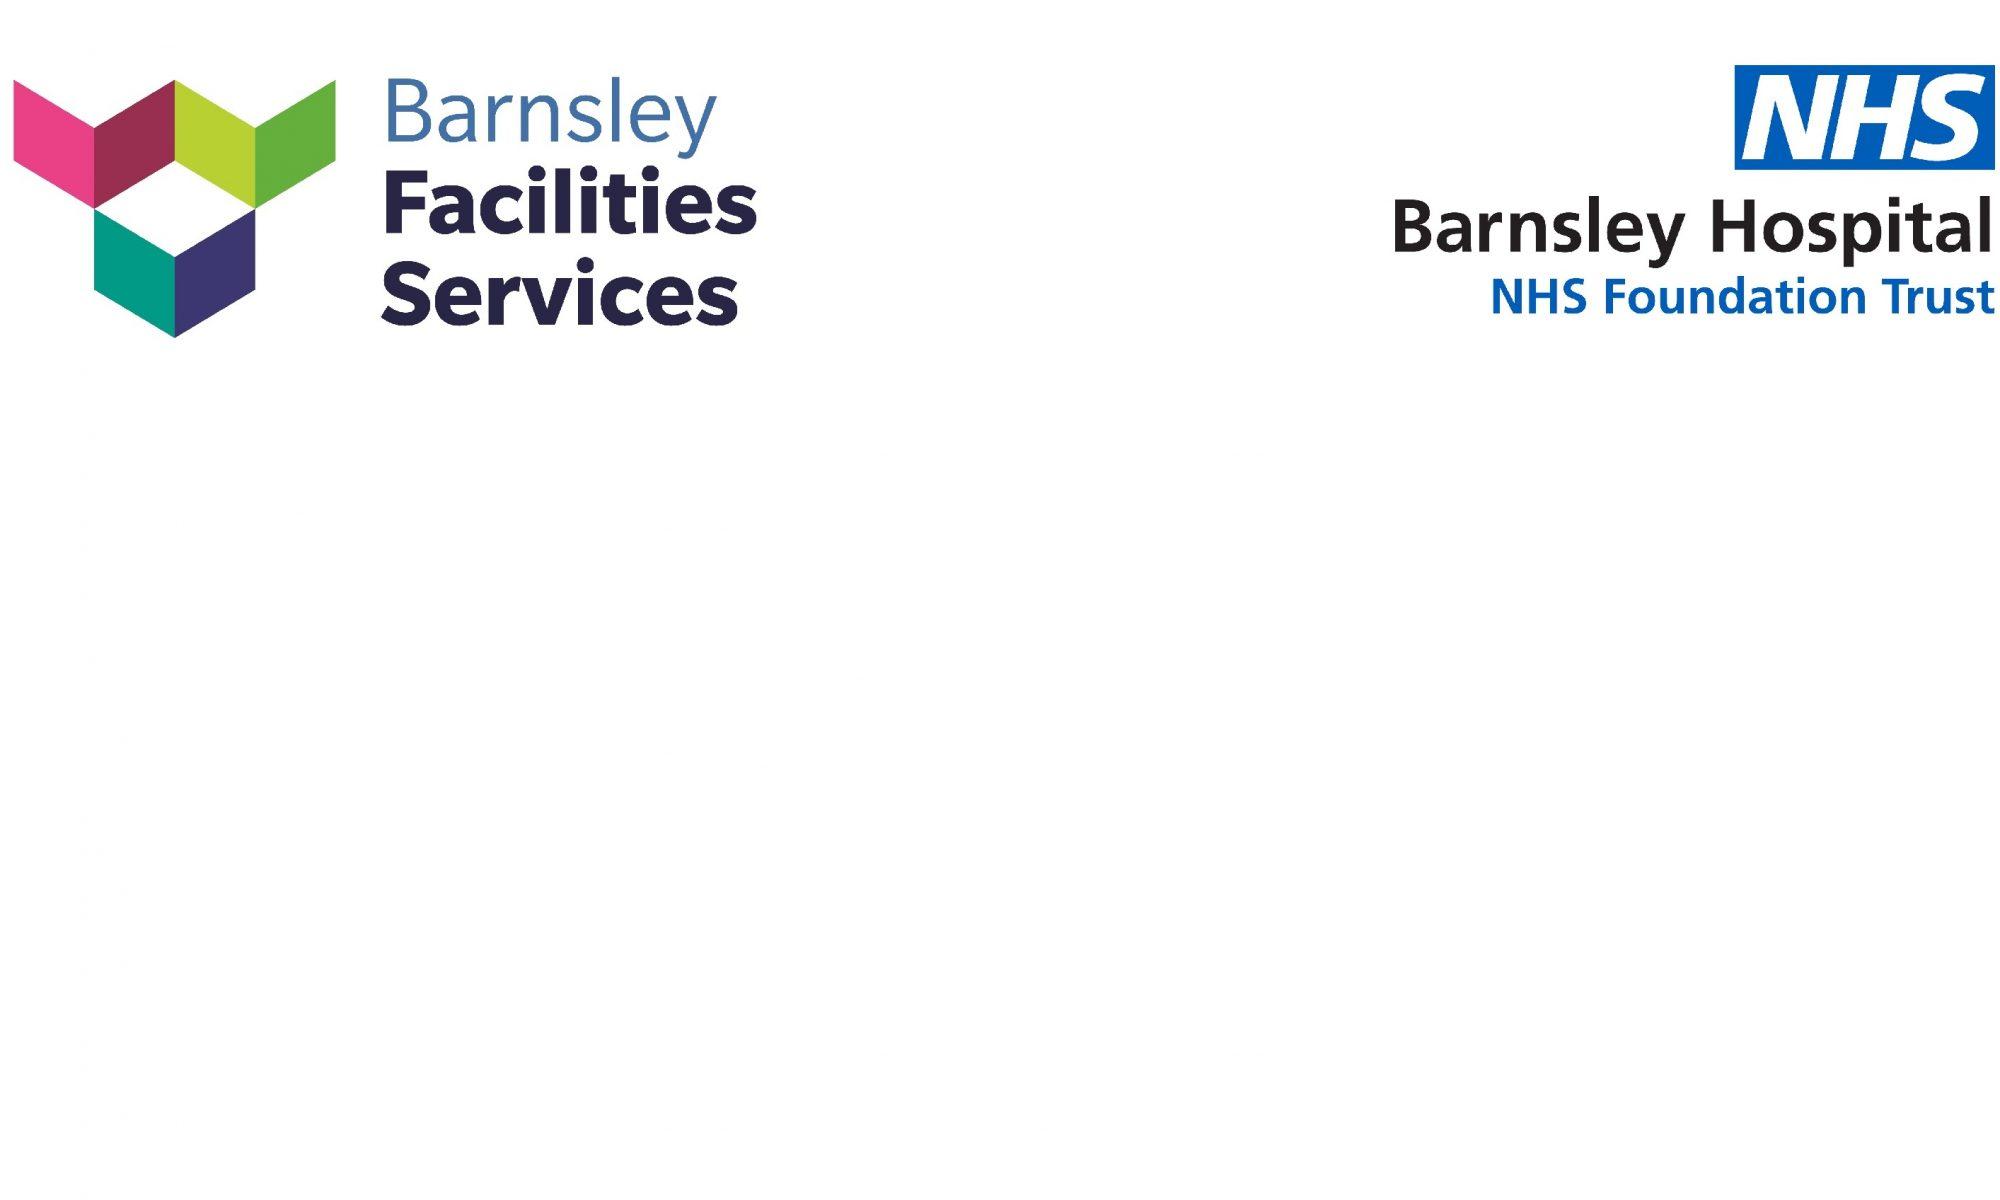 Barnsley Facility Services